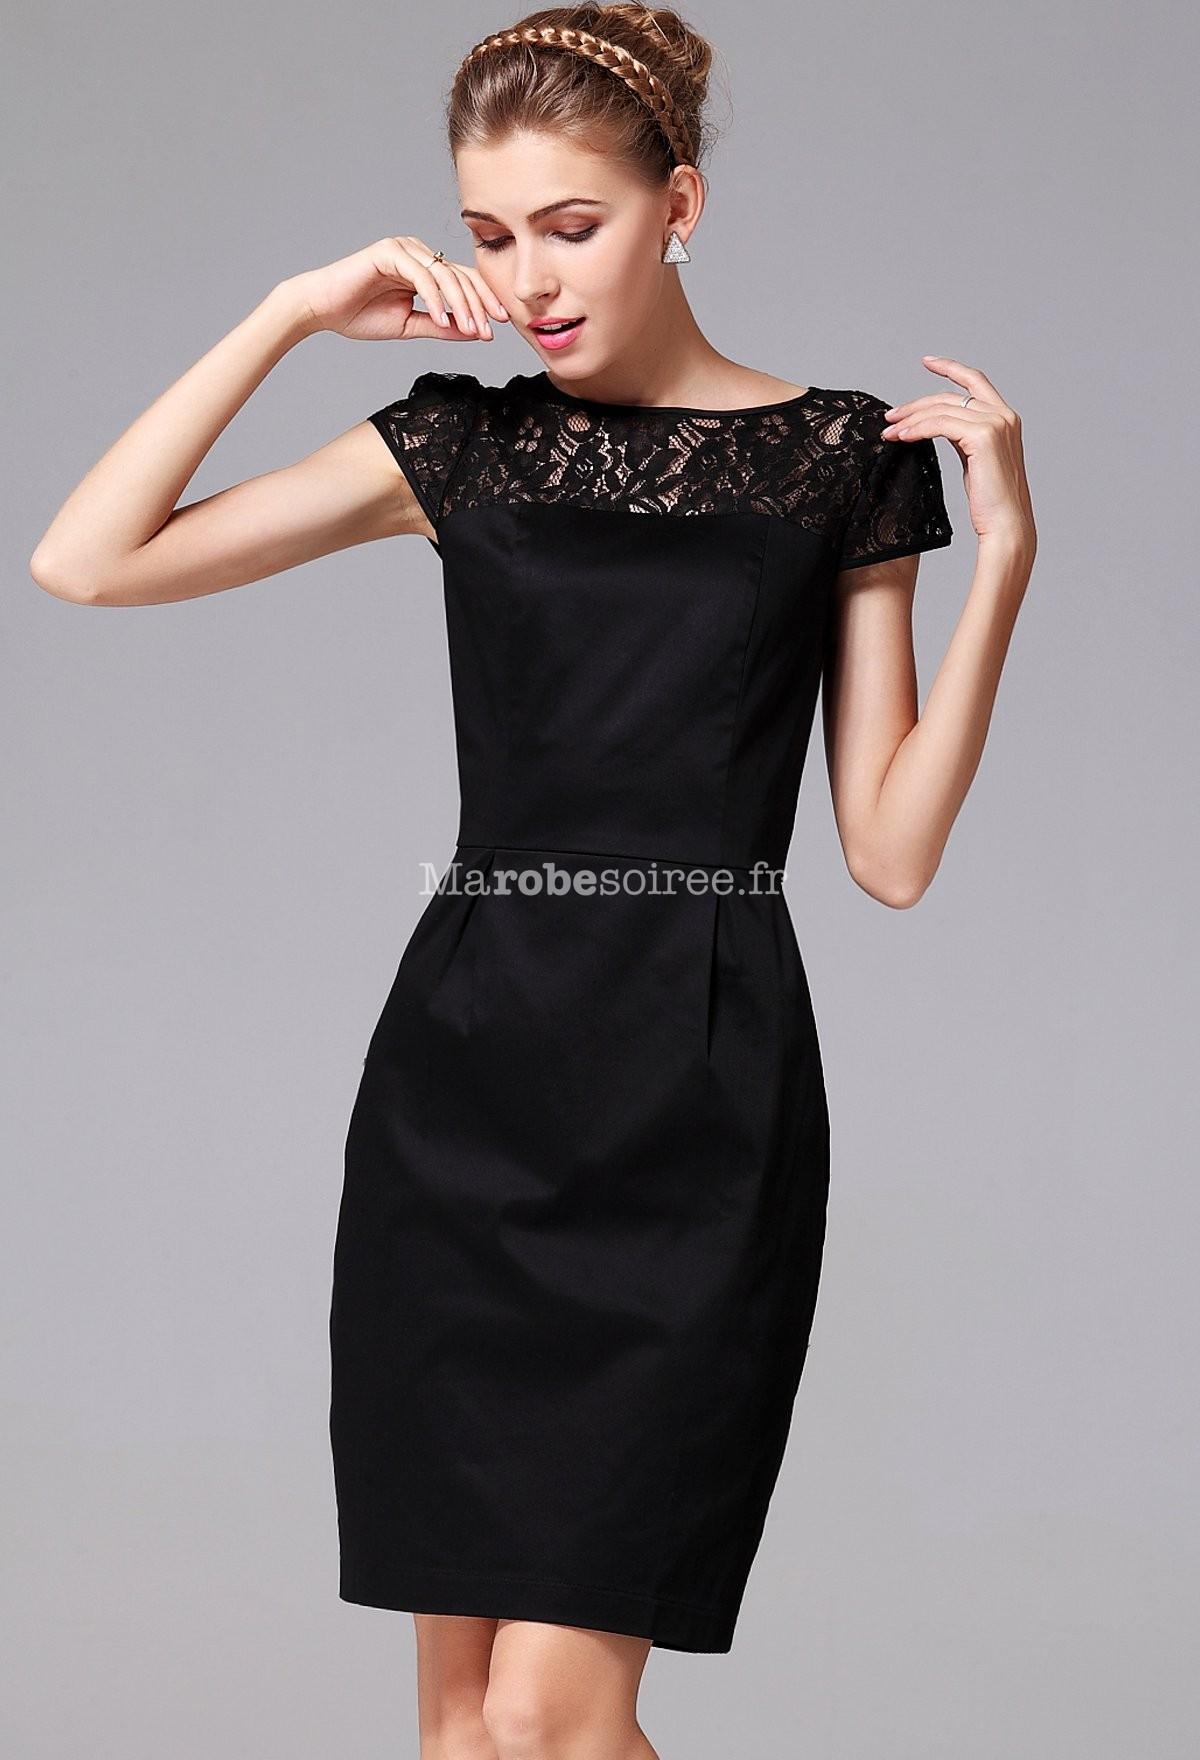 petite robe noire chic. Black Bedroom Furniture Sets. Home Design Ideas